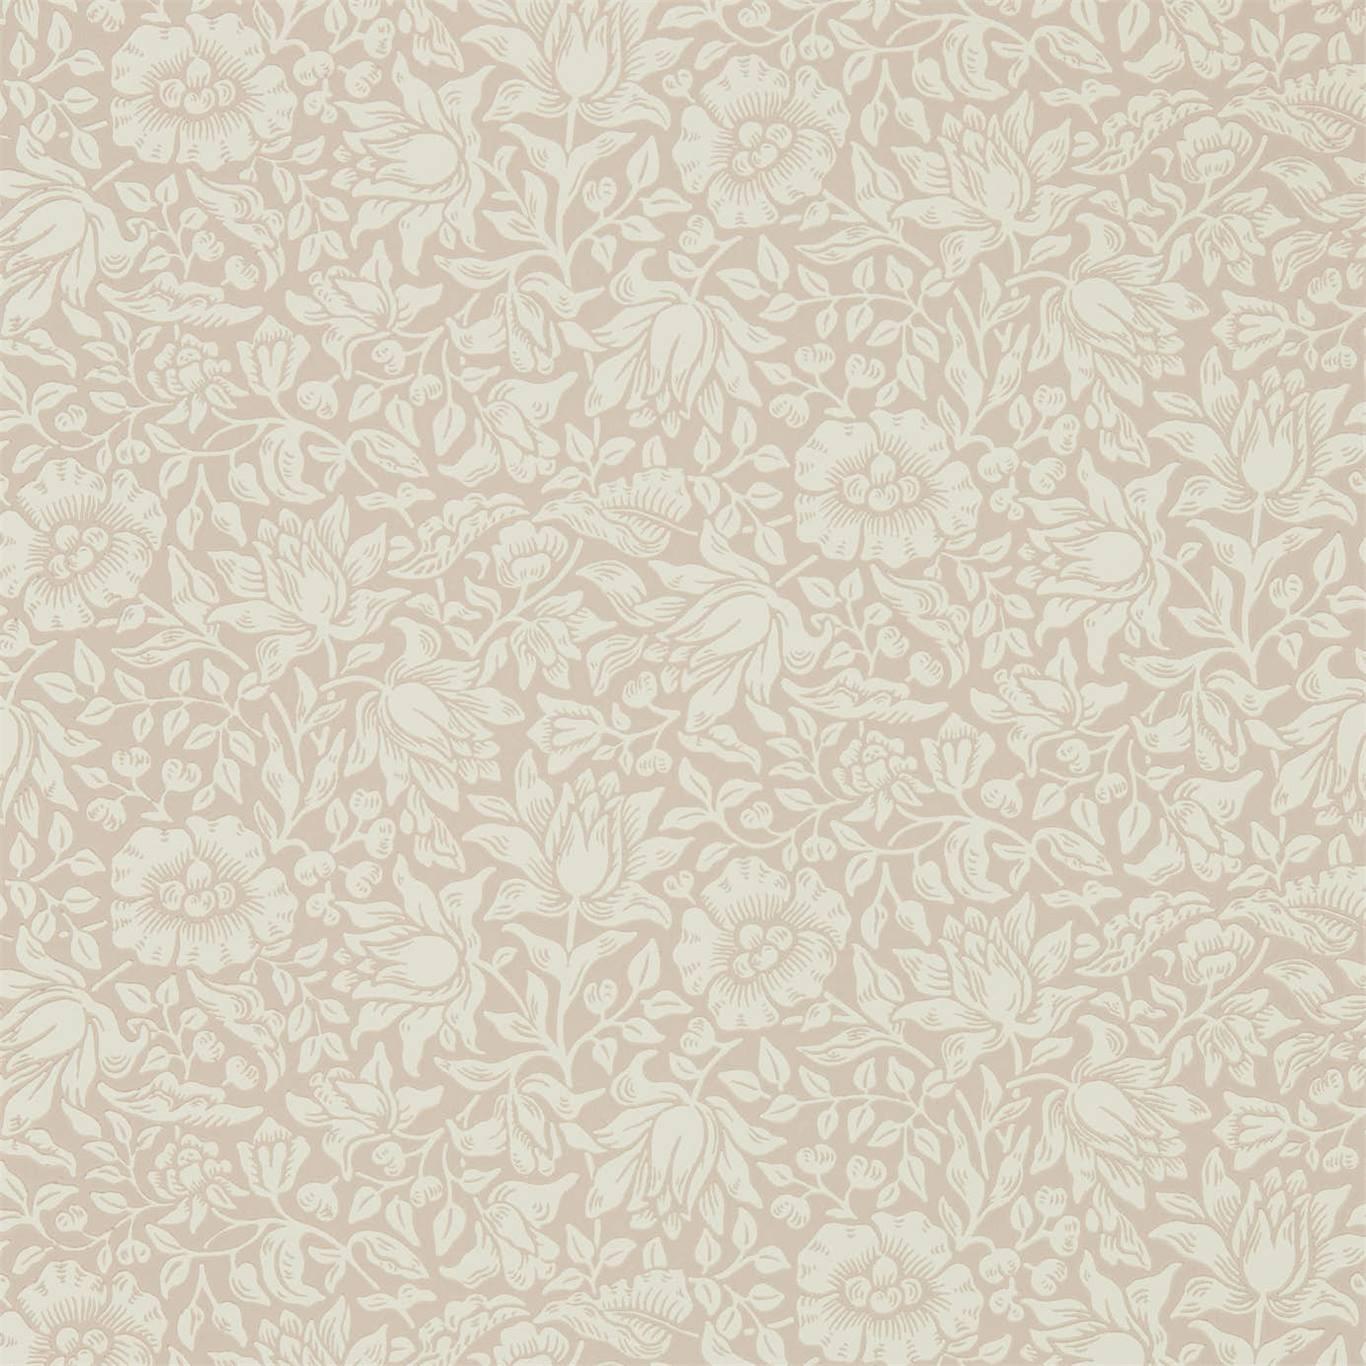 Image of Morris & Co Mallow Dusky Rose Wallpaper 216675